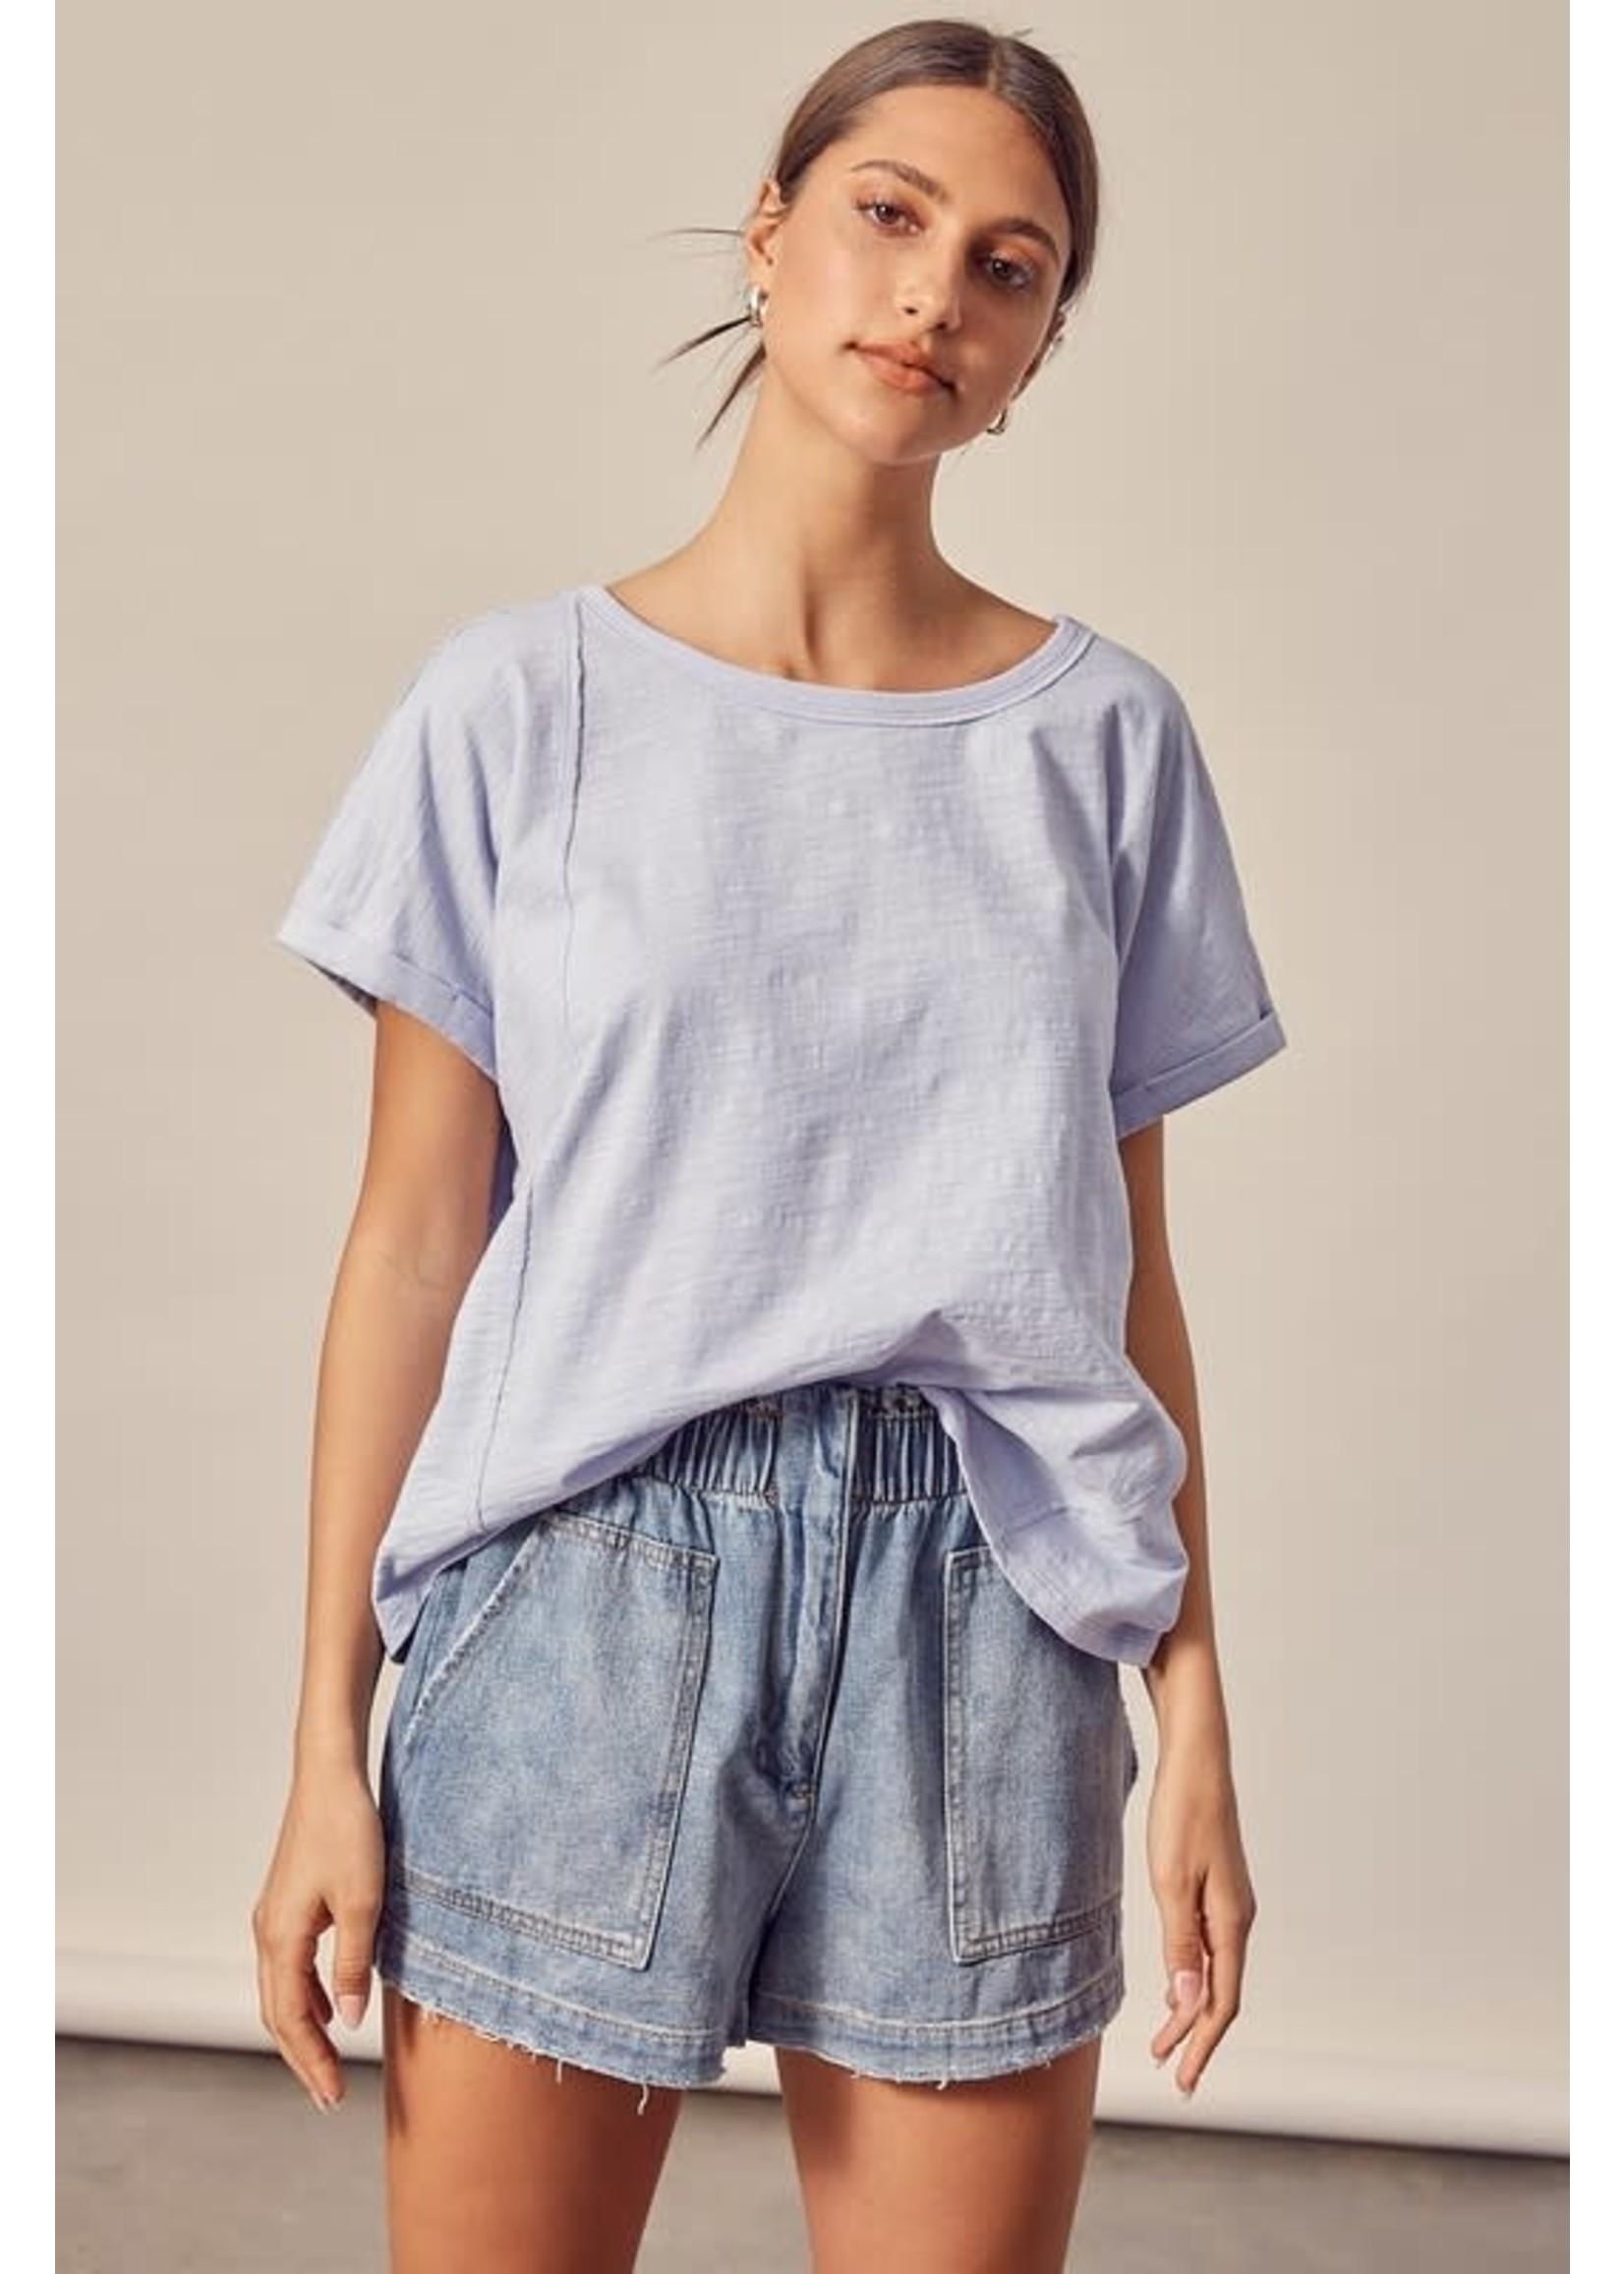 Mustard Seed Solid Short Sleeve T-Shirt - S17393